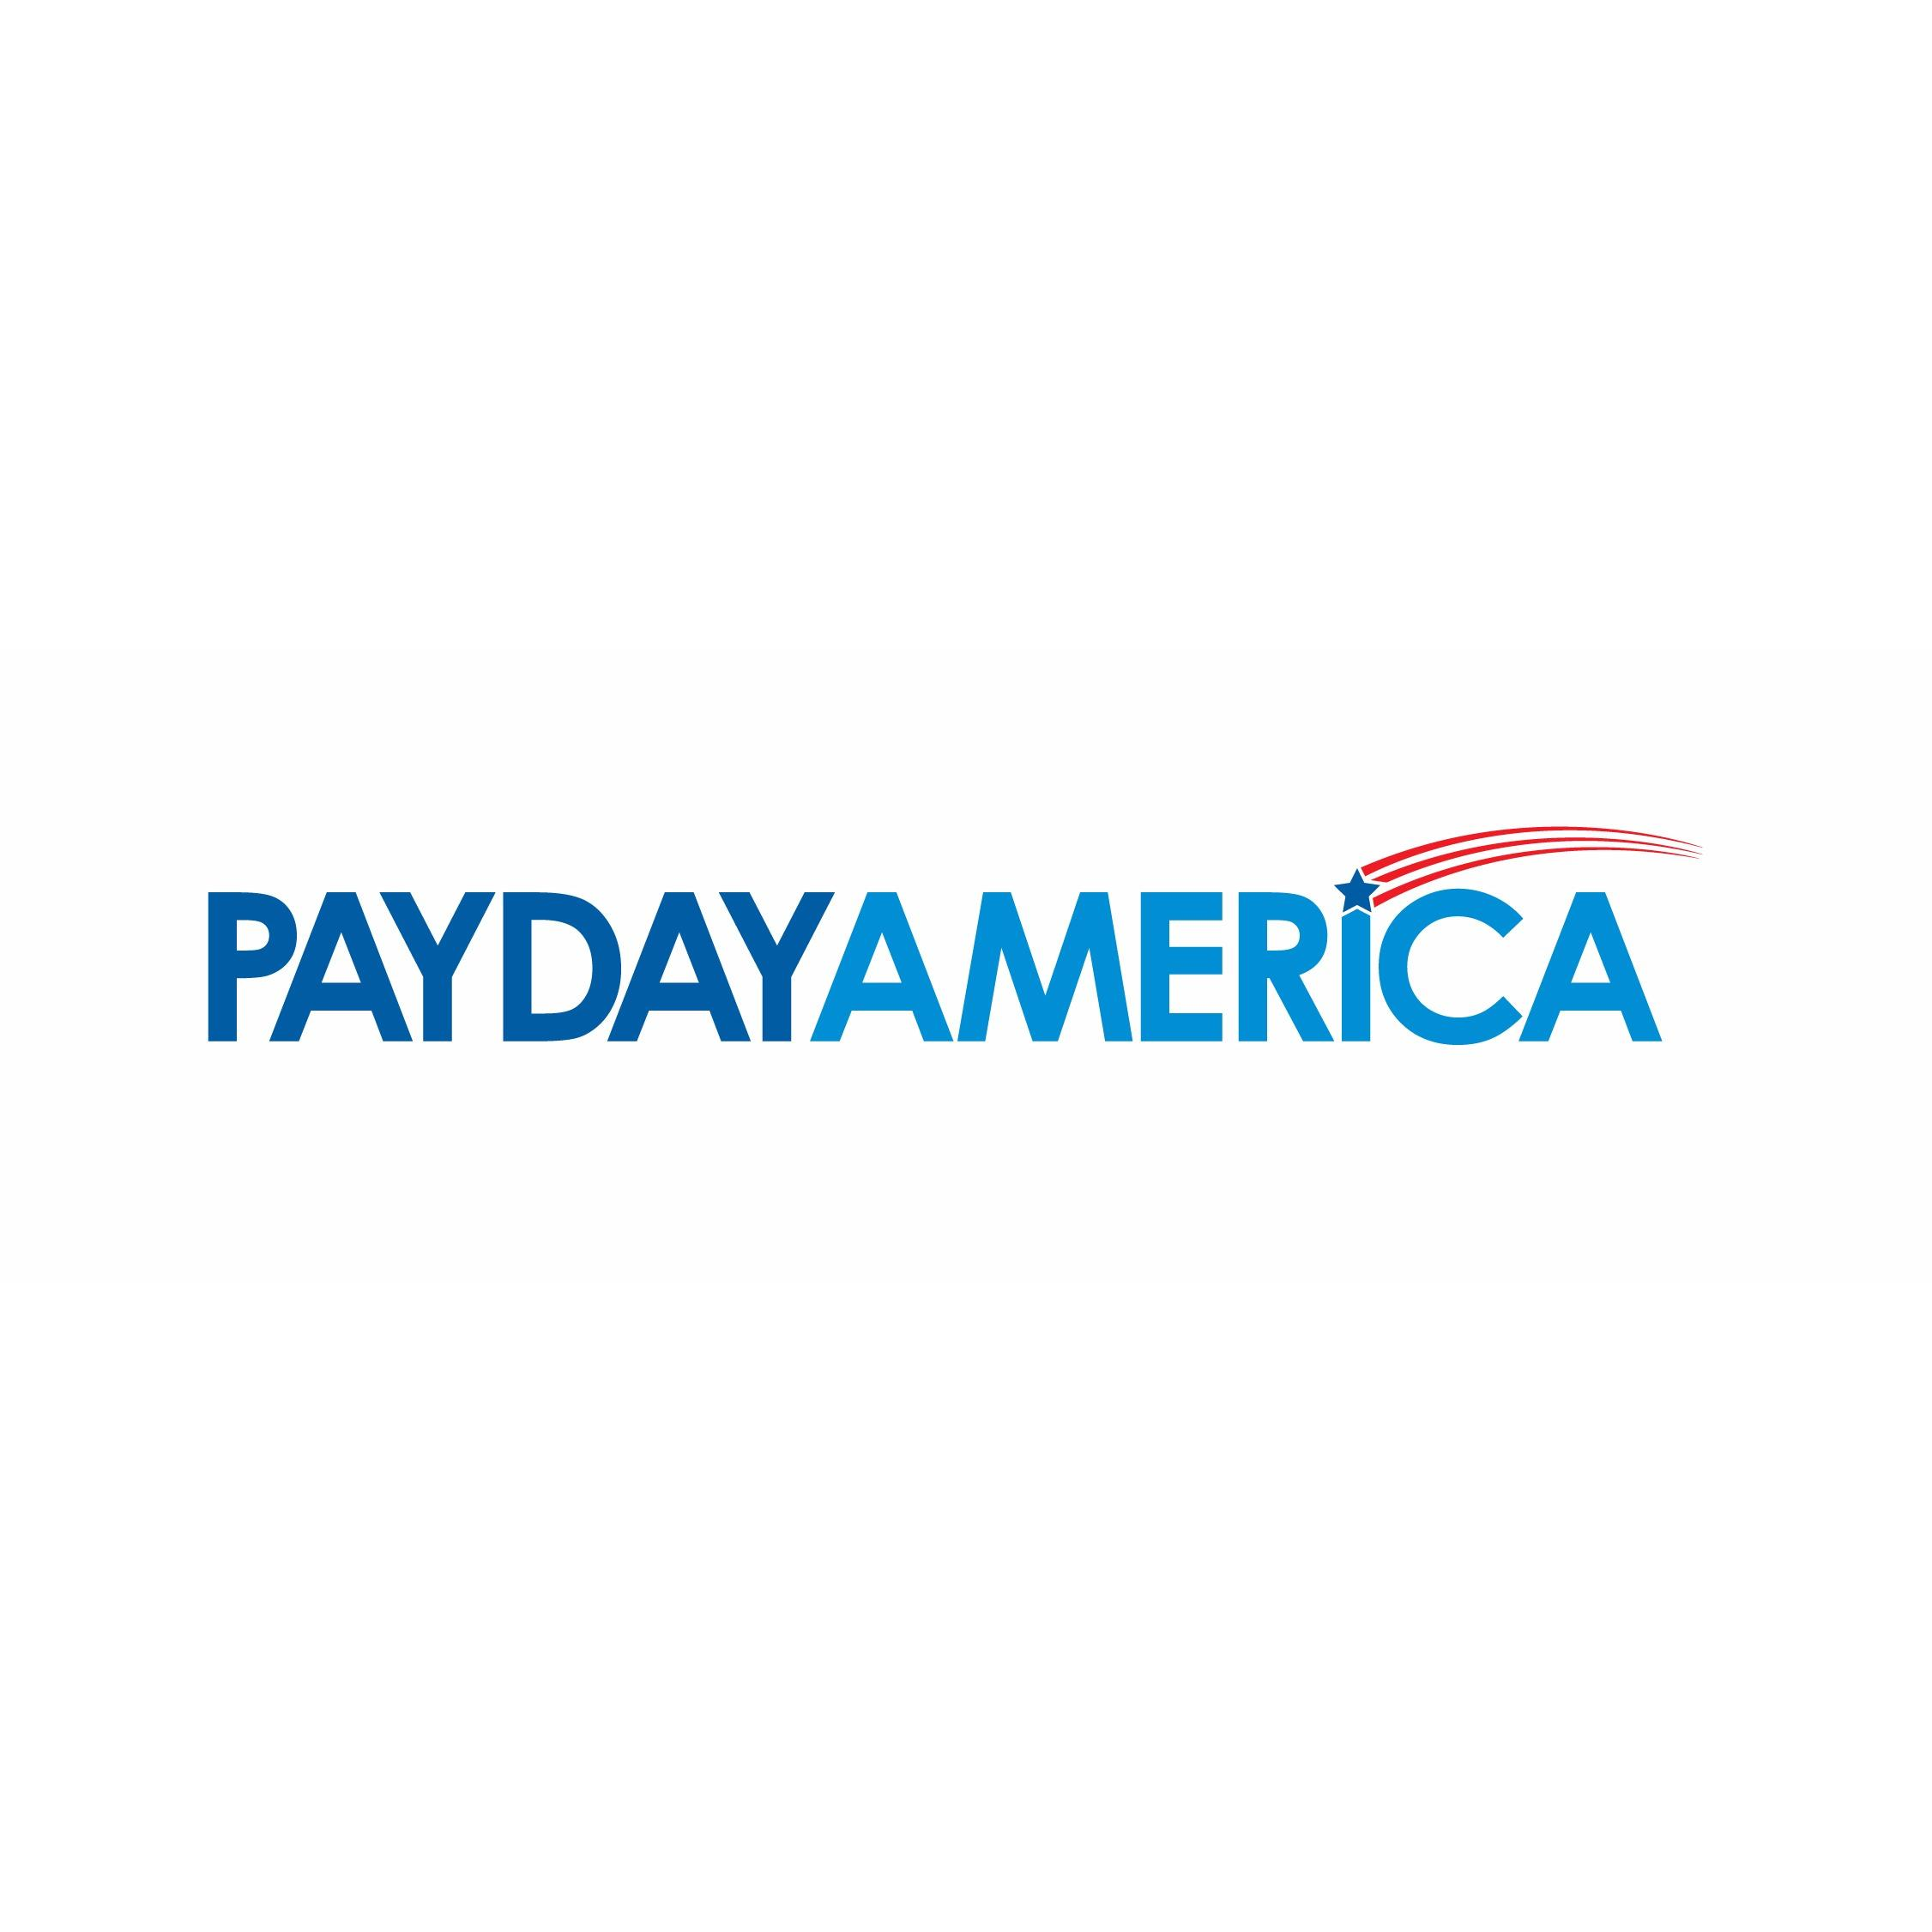 Payday America